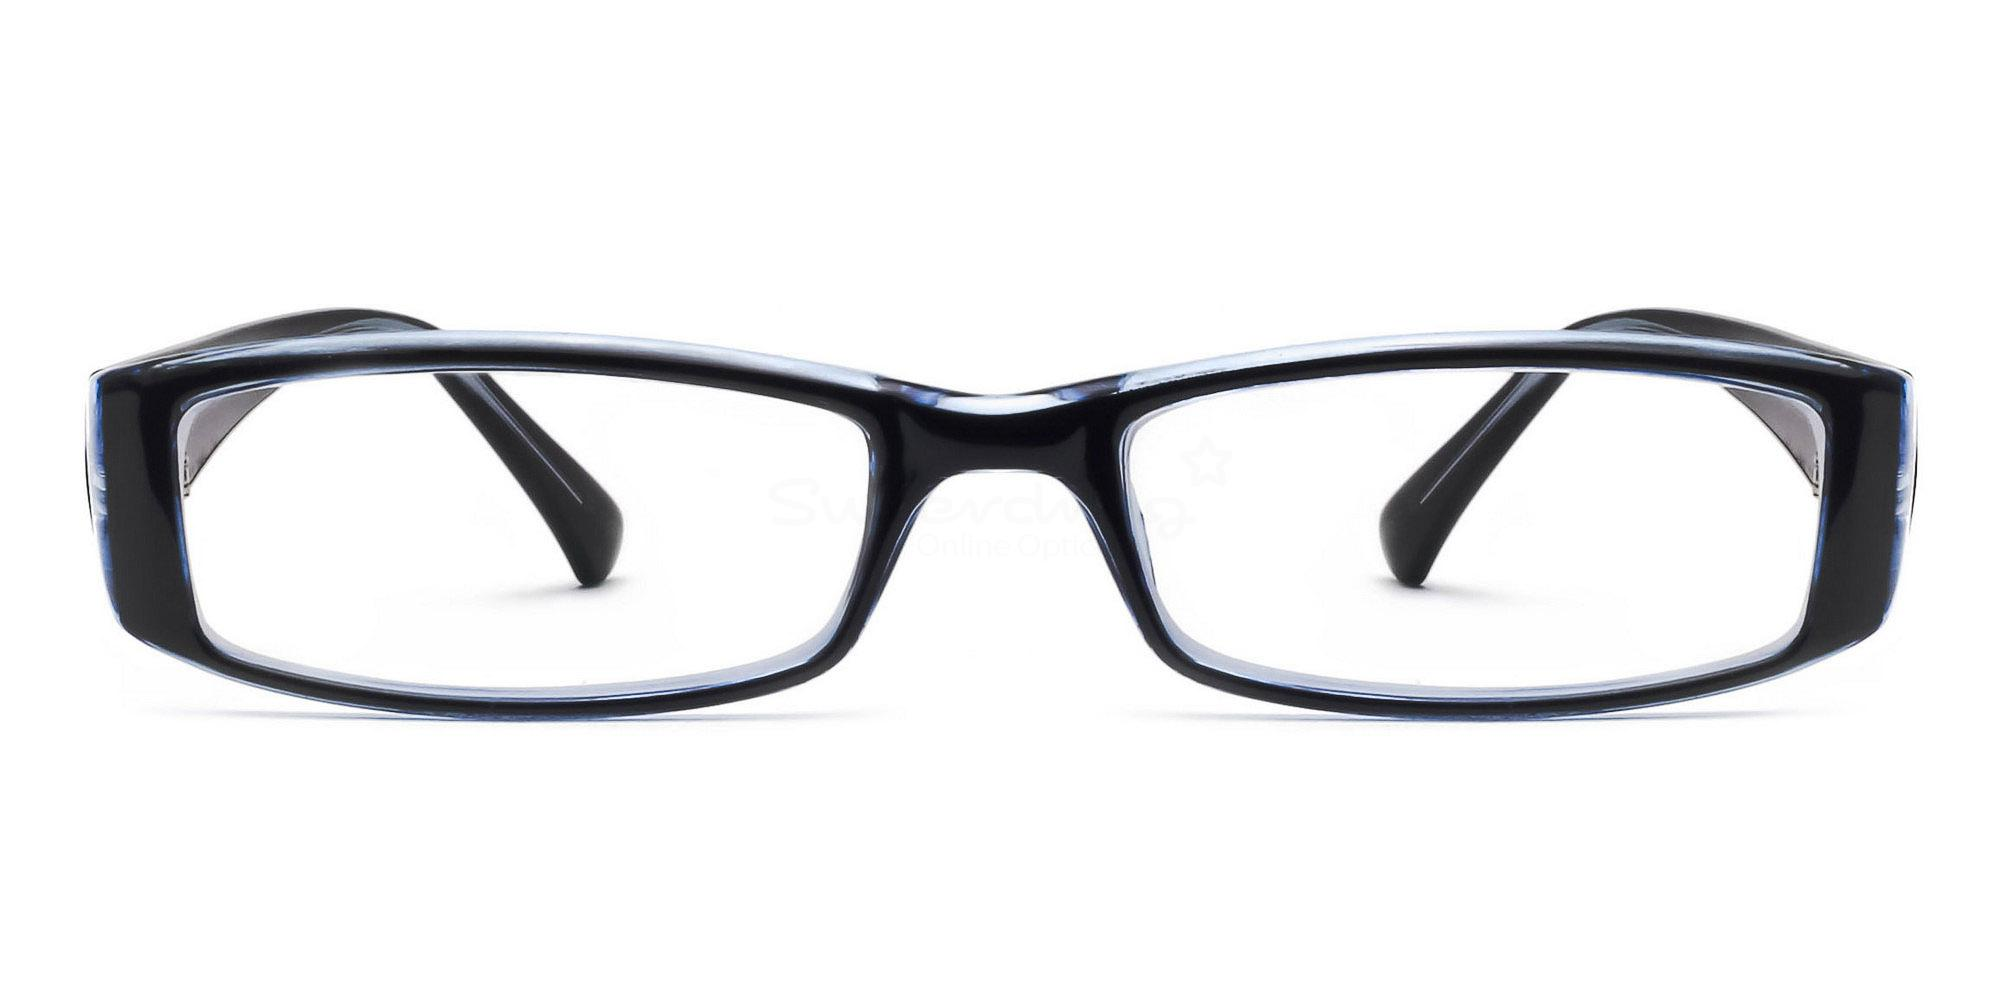 C48 P2251 - Black and Blue Glasses, Helium